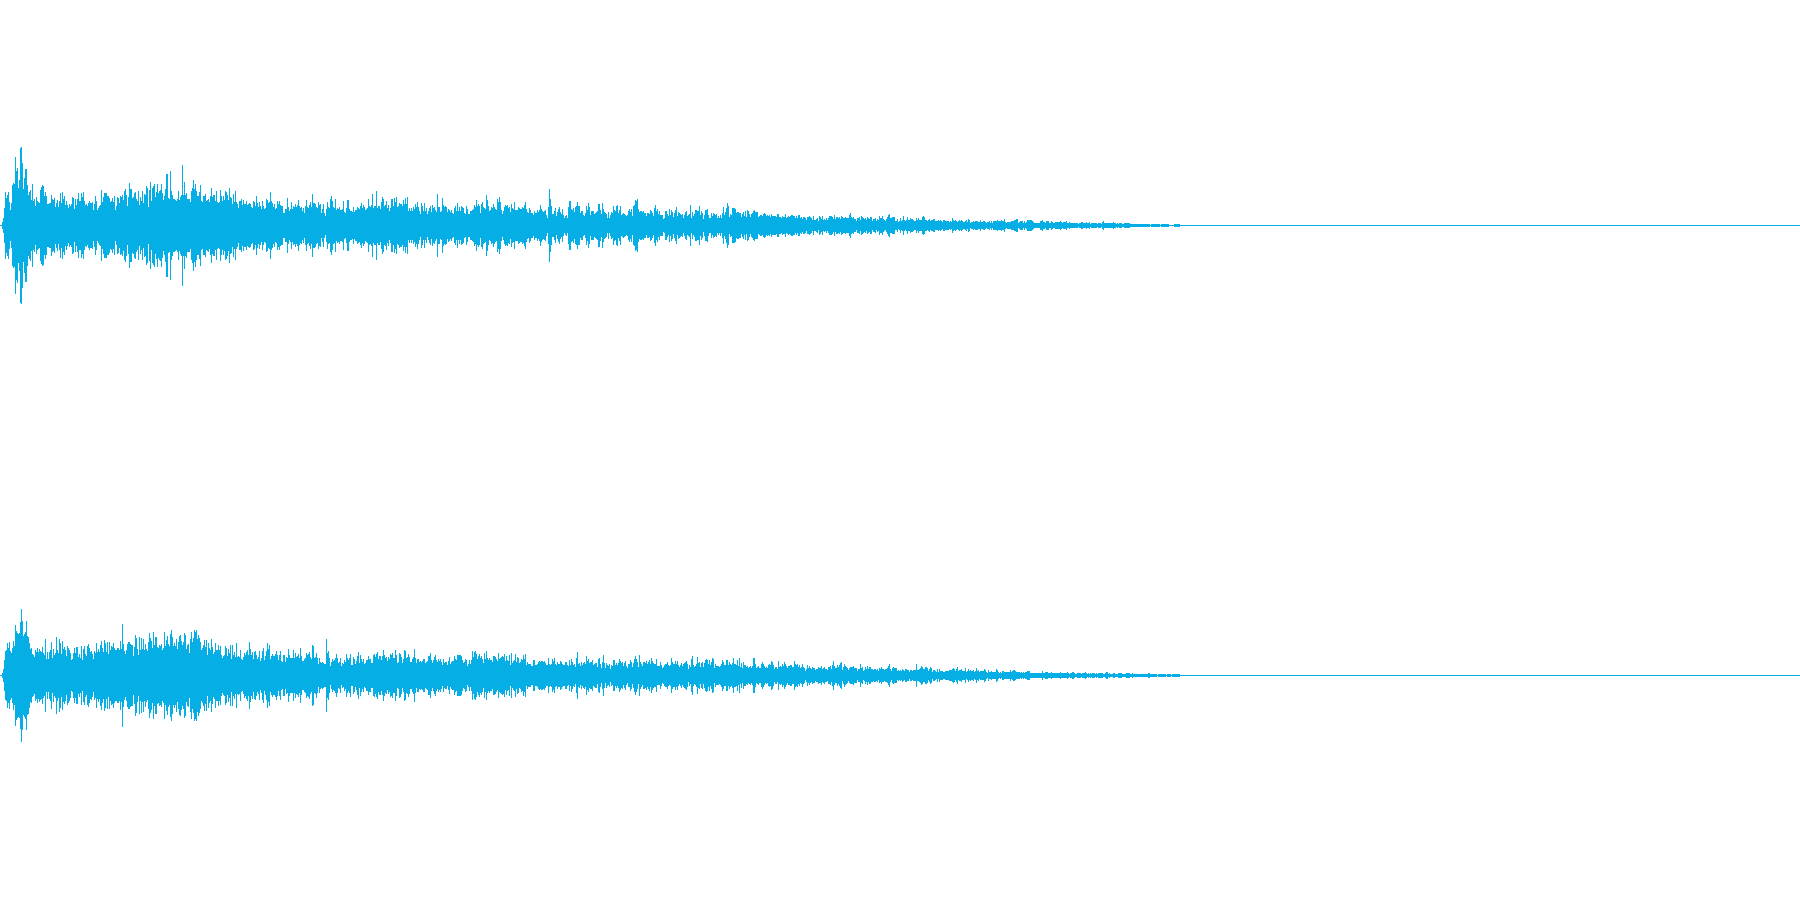 A♯メジャー インパクト音 衝撃音の再生済みの波形